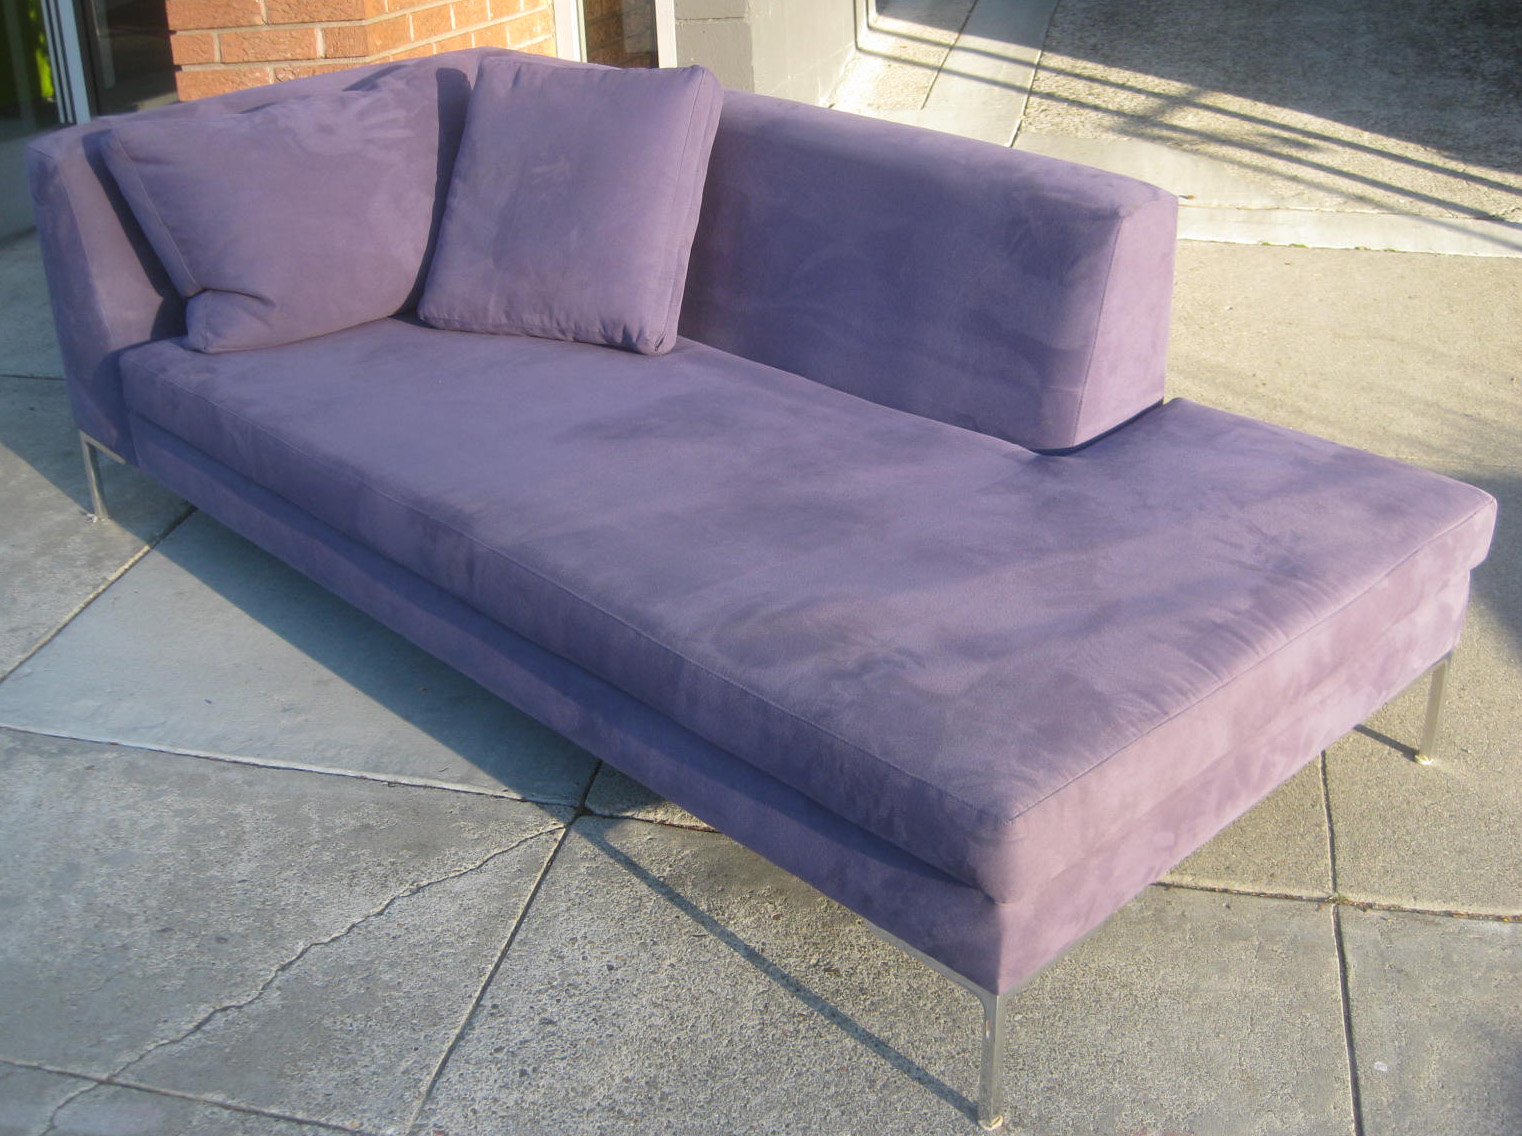 Sold purple chaise lounge ottoman 250